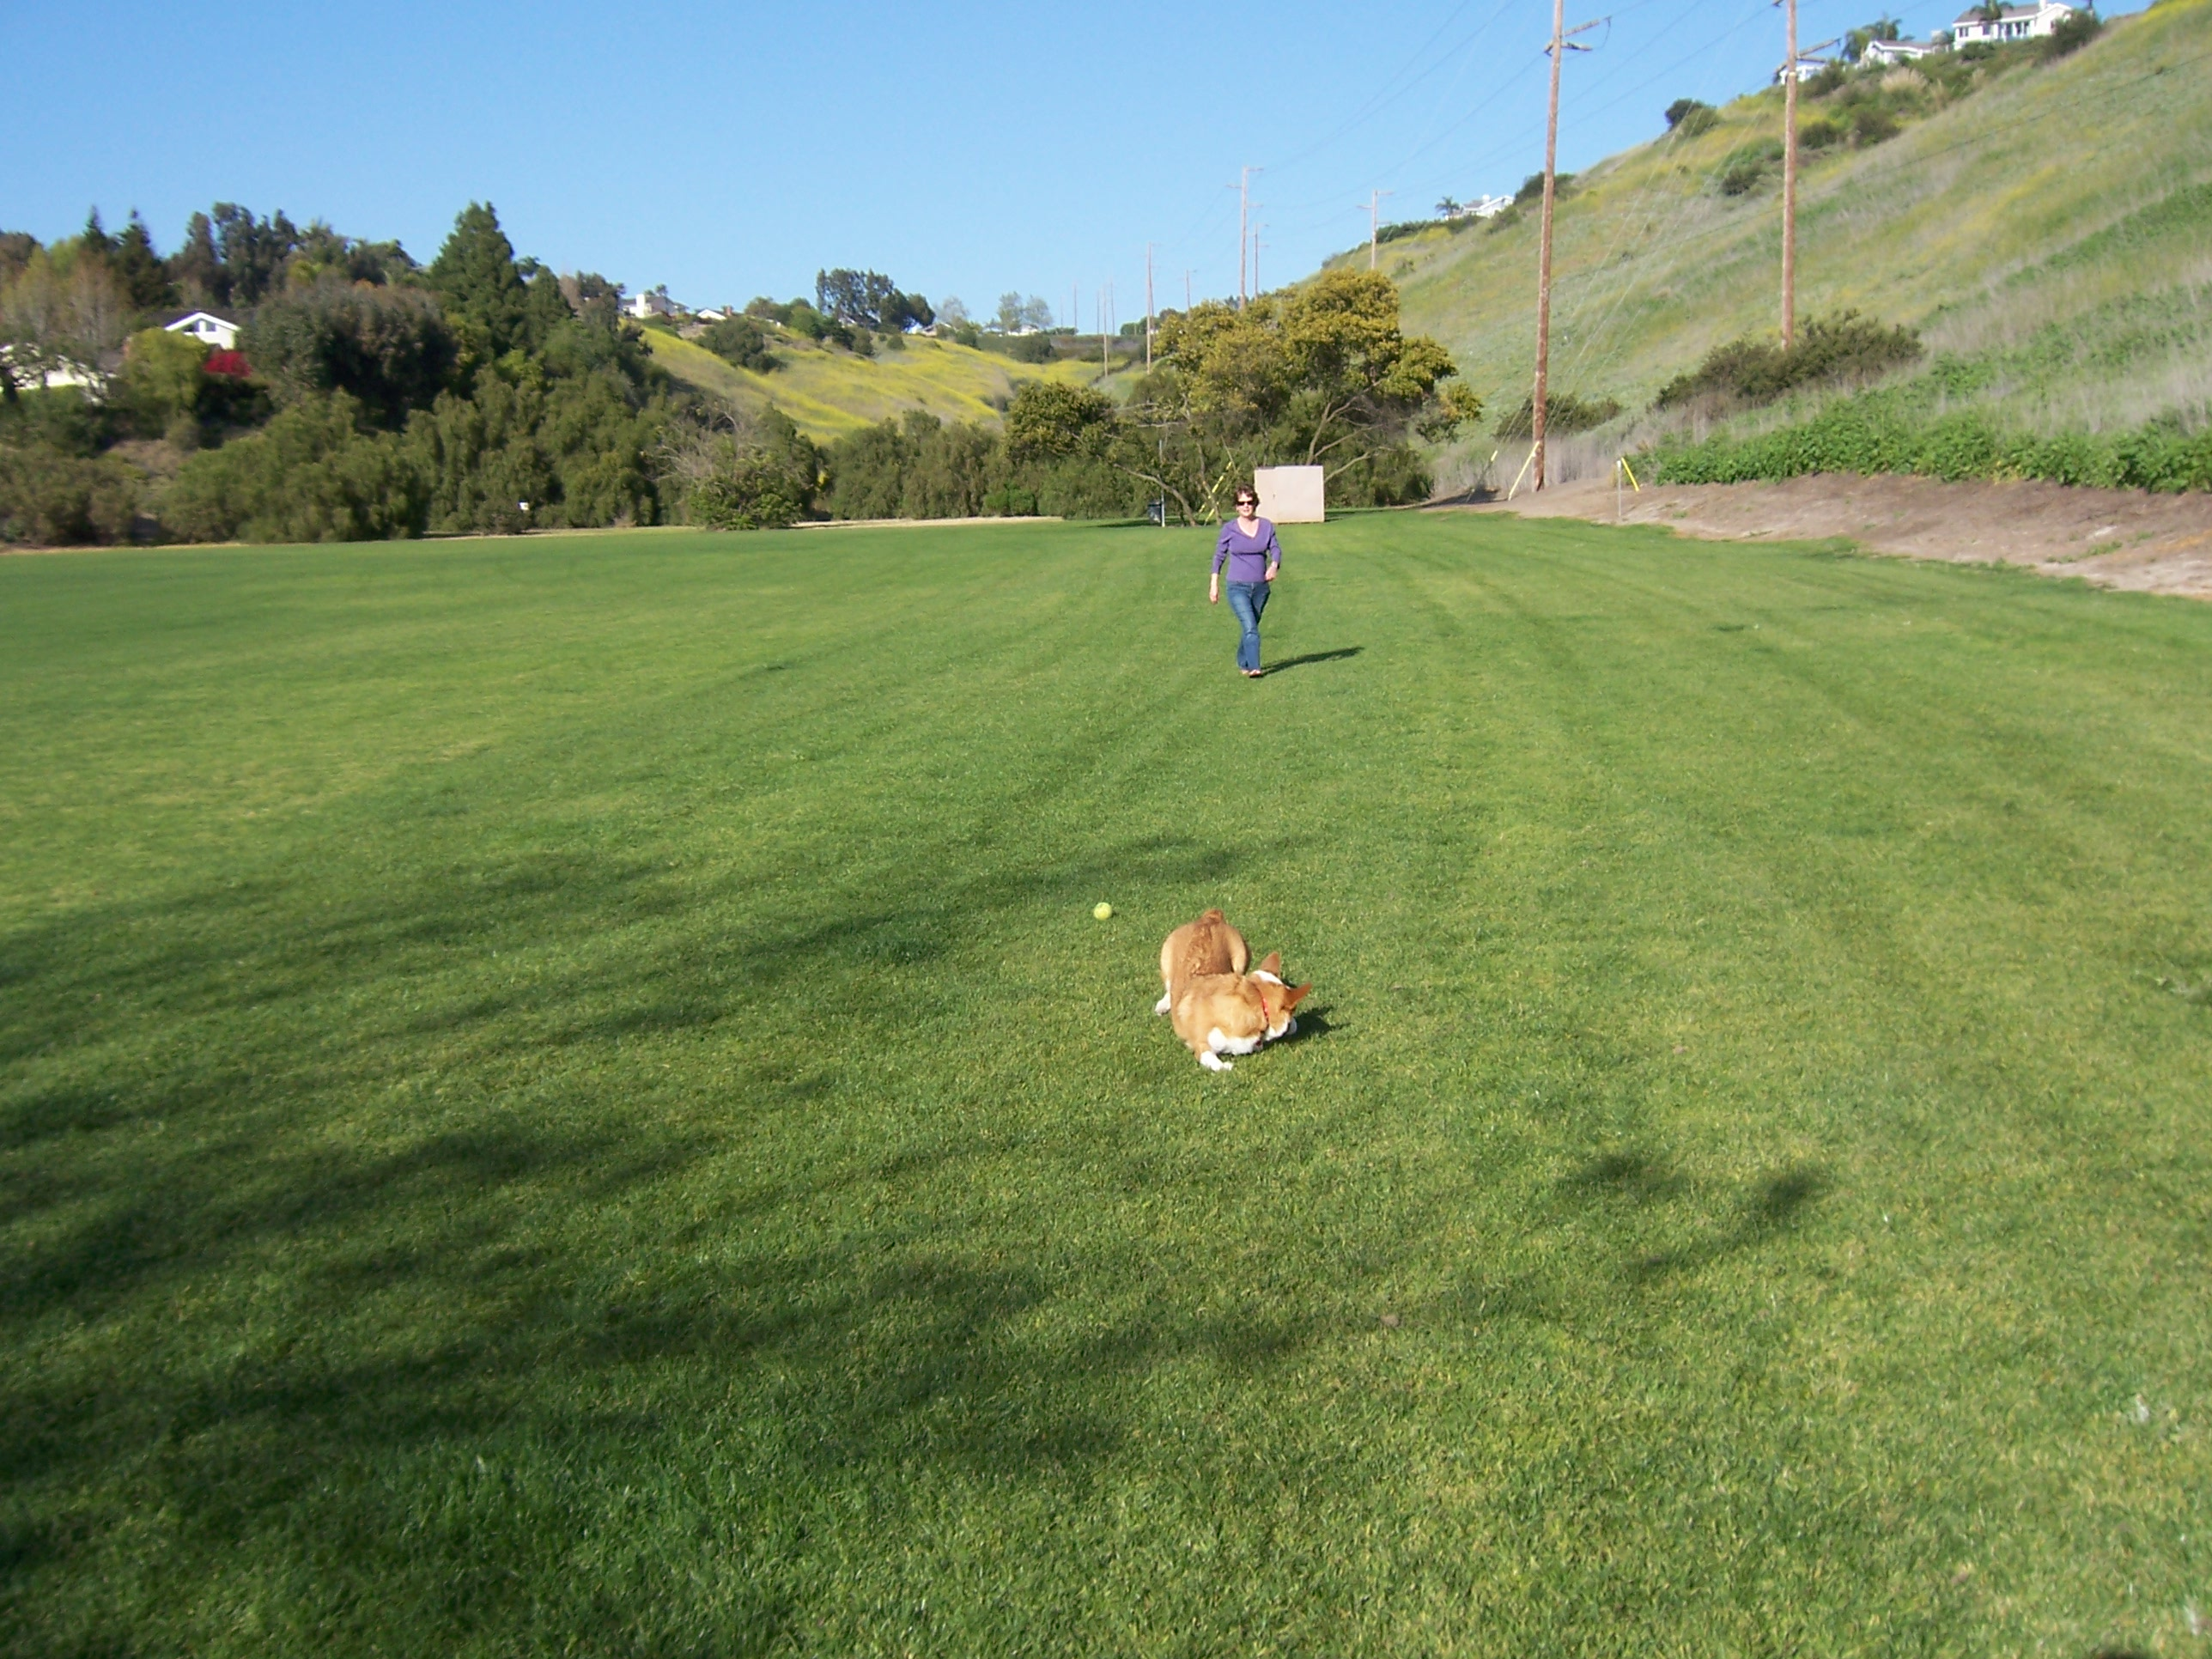 lando at park